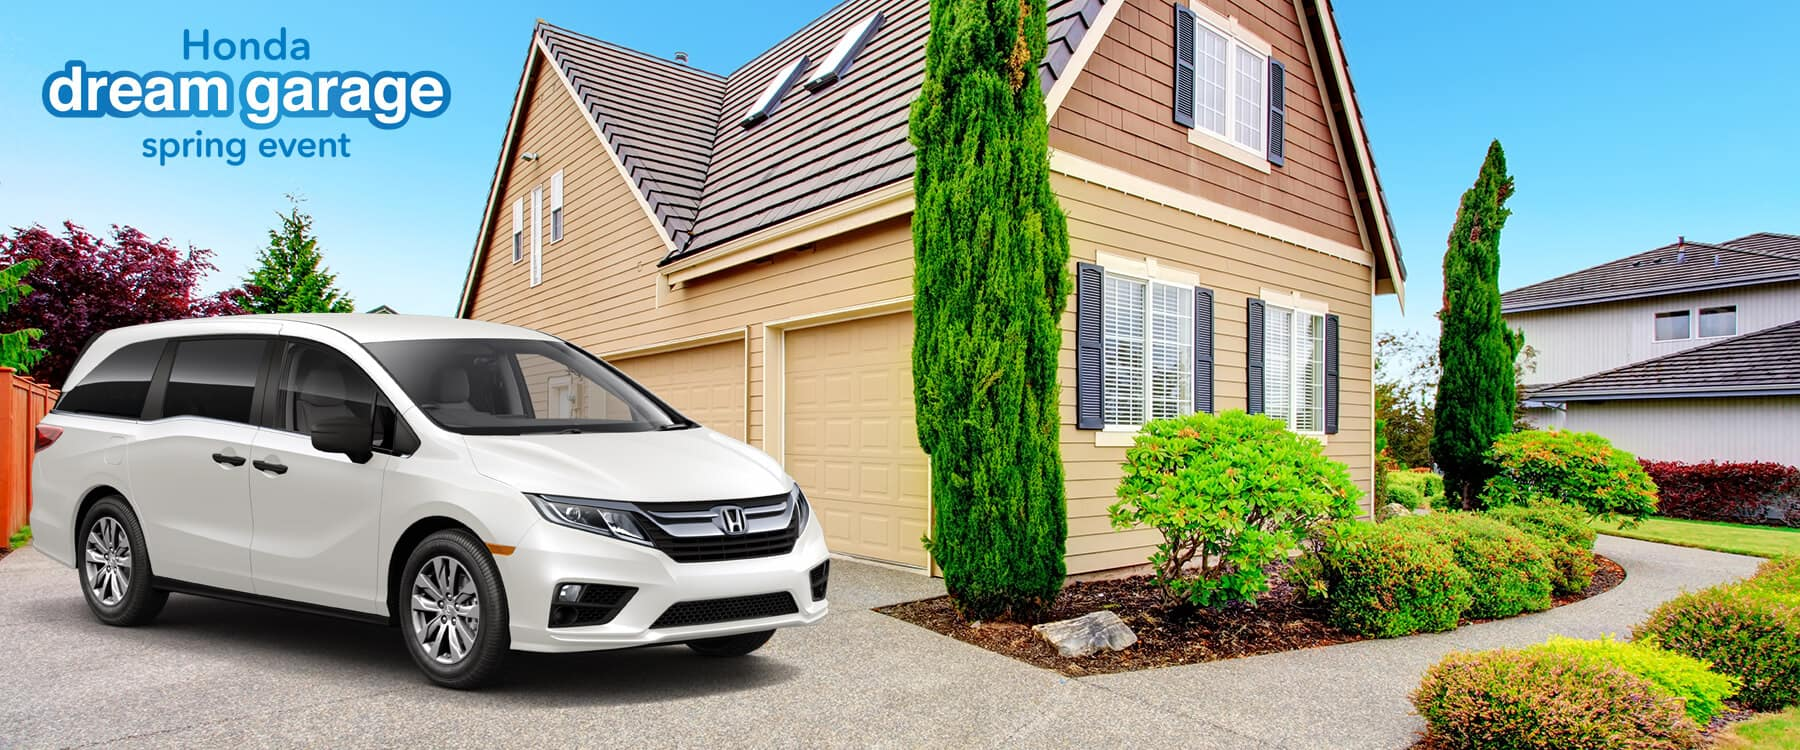 Honda Dream Garage Spring Event 2019 Odyssey Slider